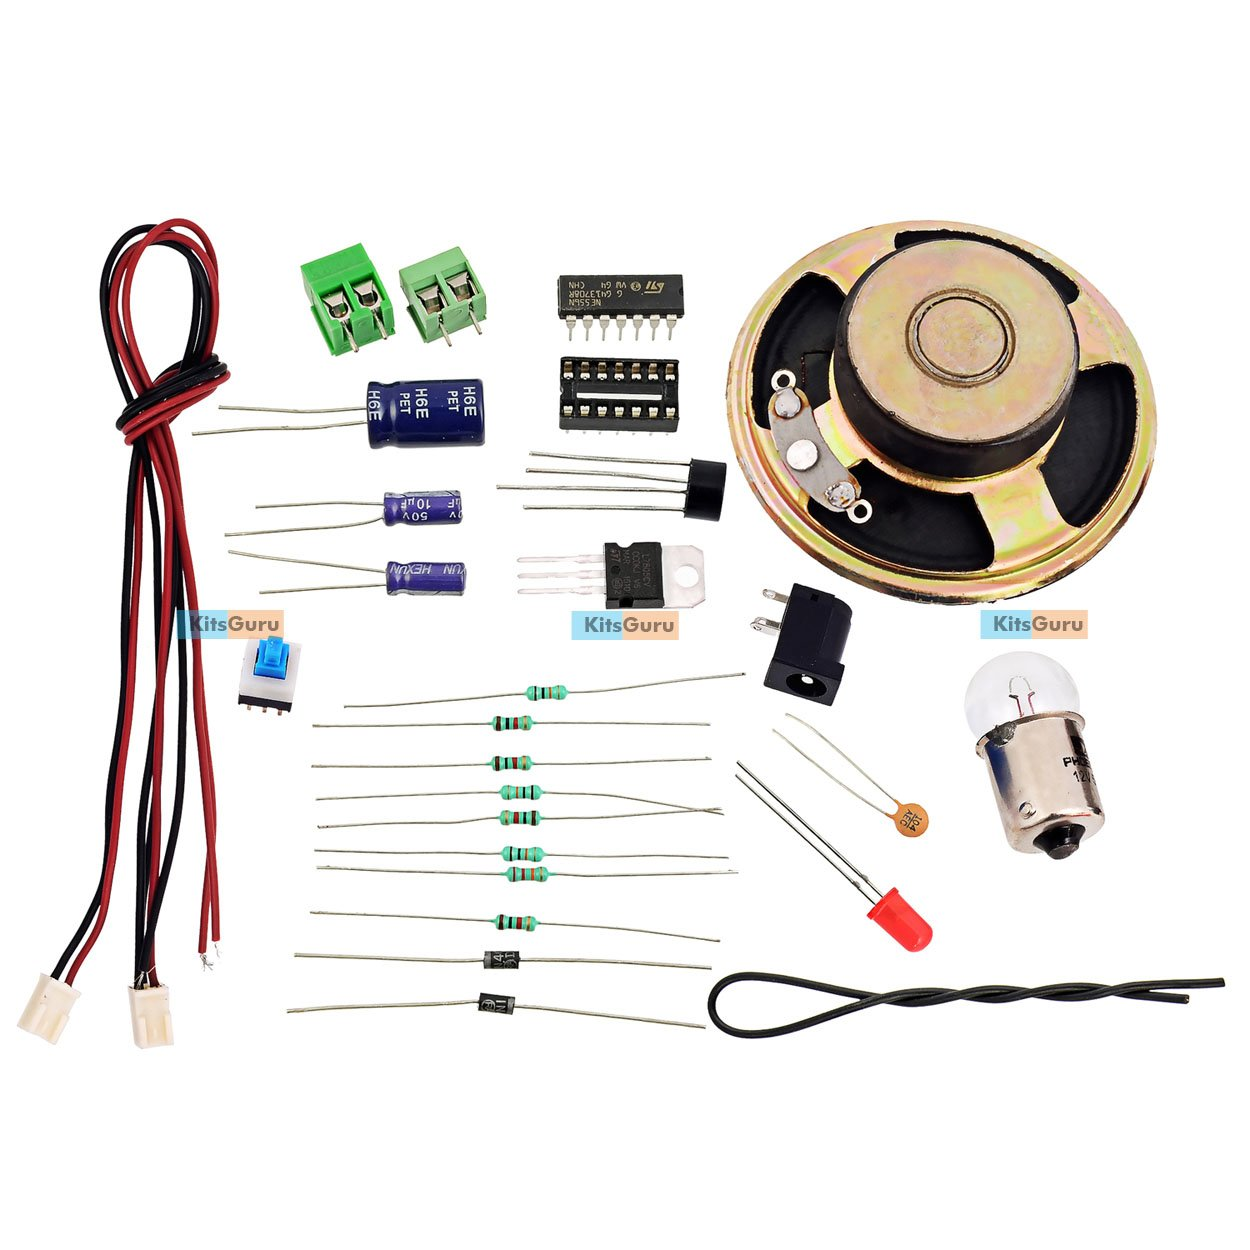 Diy Kit Us Police Siren Lgkt124 Easy Electronic Projects Amazon Circuit Diagram